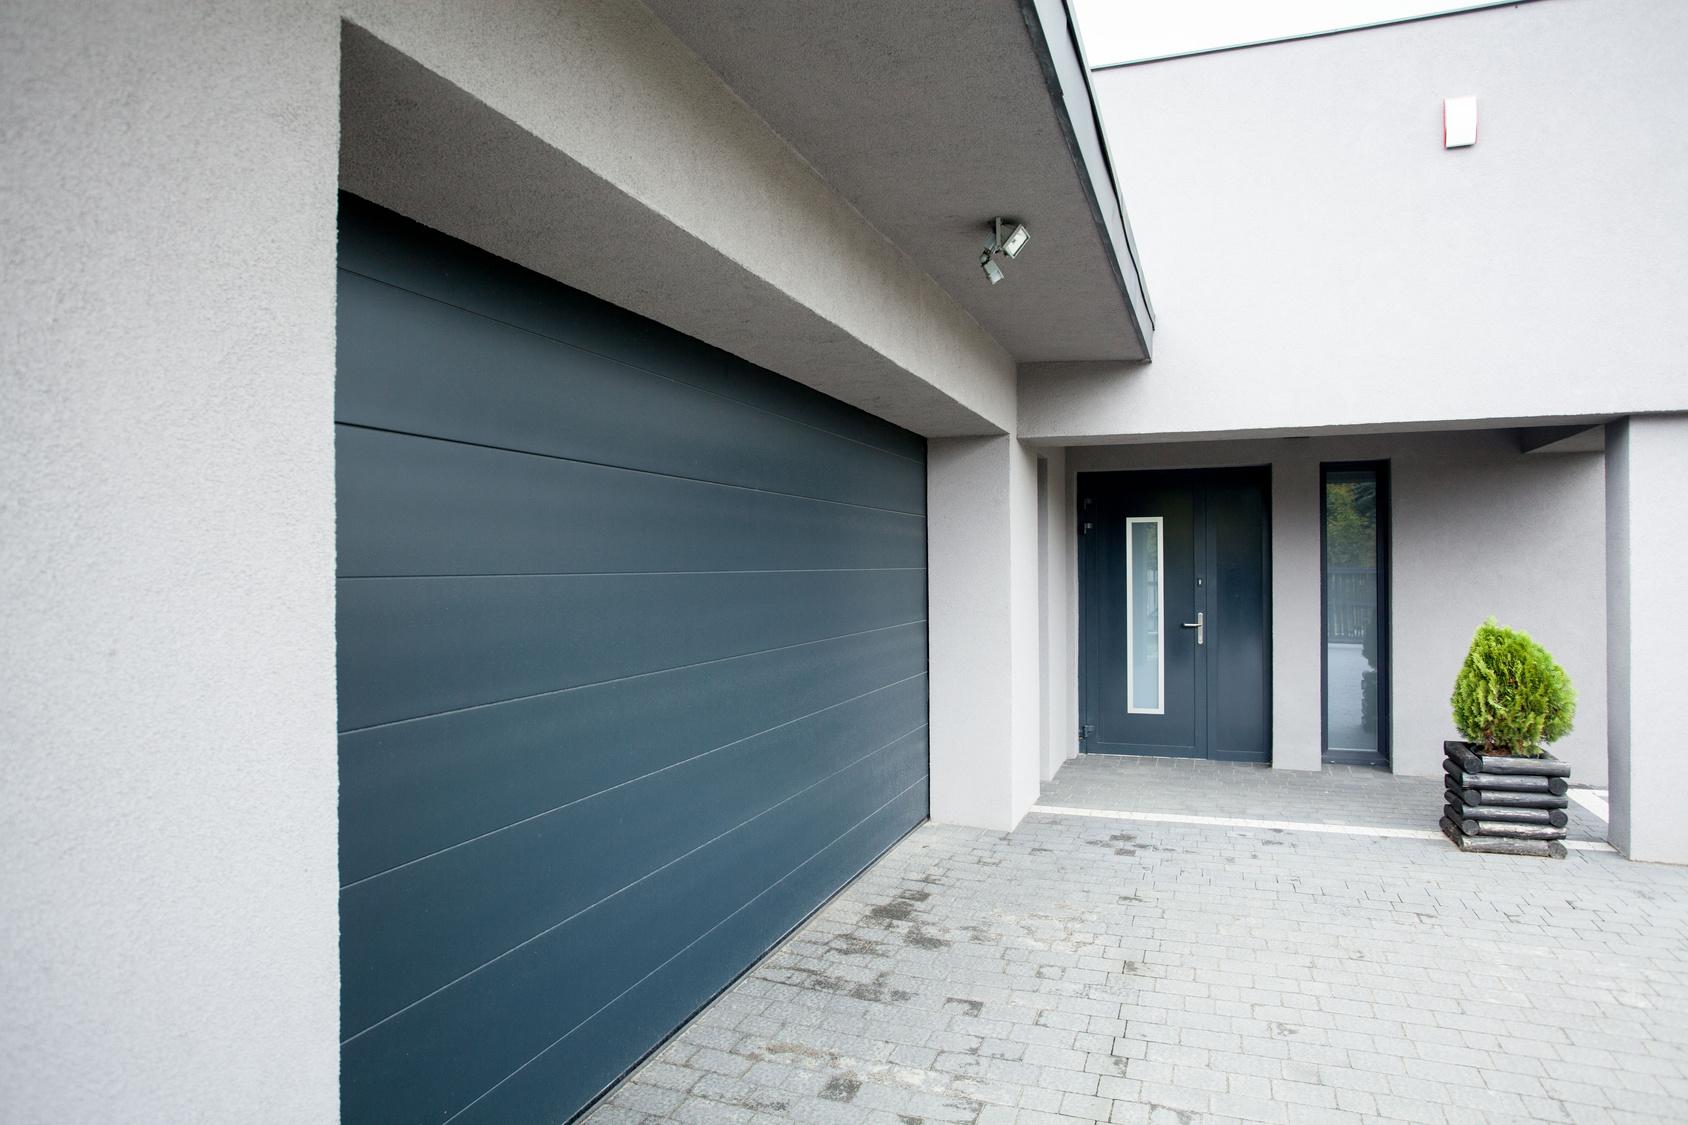 Garage door in Lansing MI